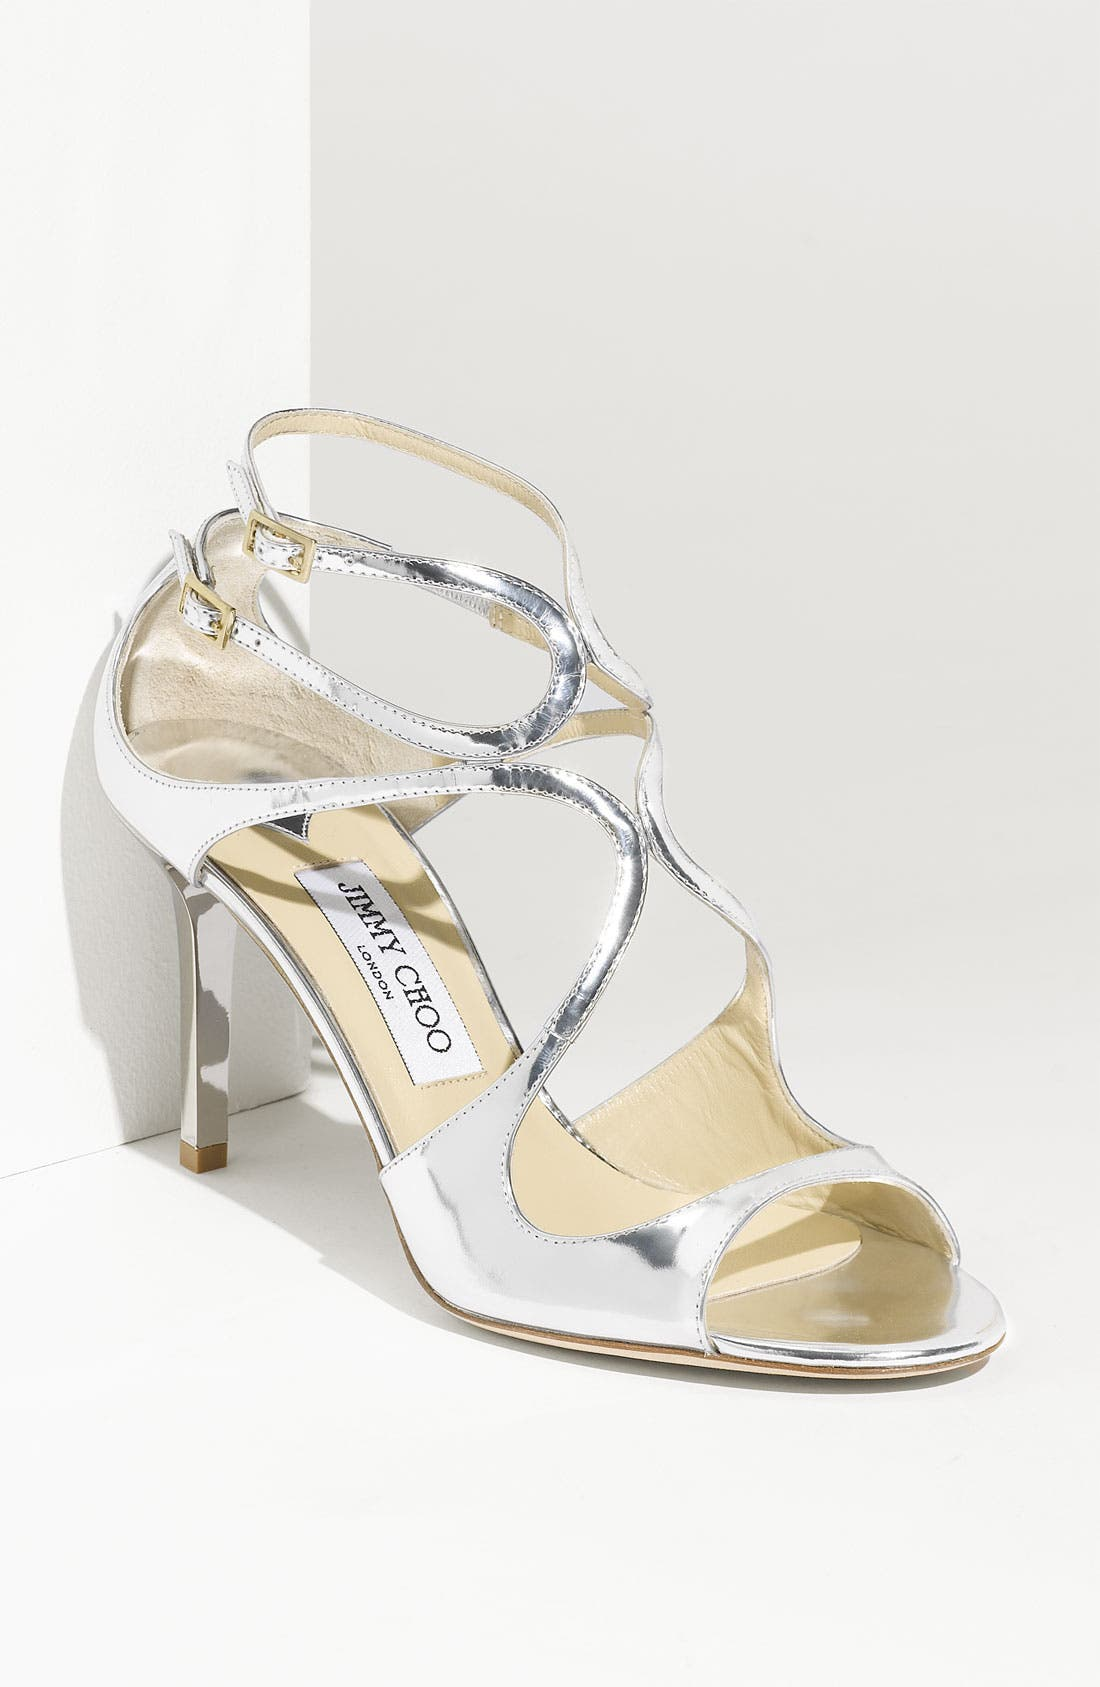 'Ivette' Strap Sandal, Main, color, 040